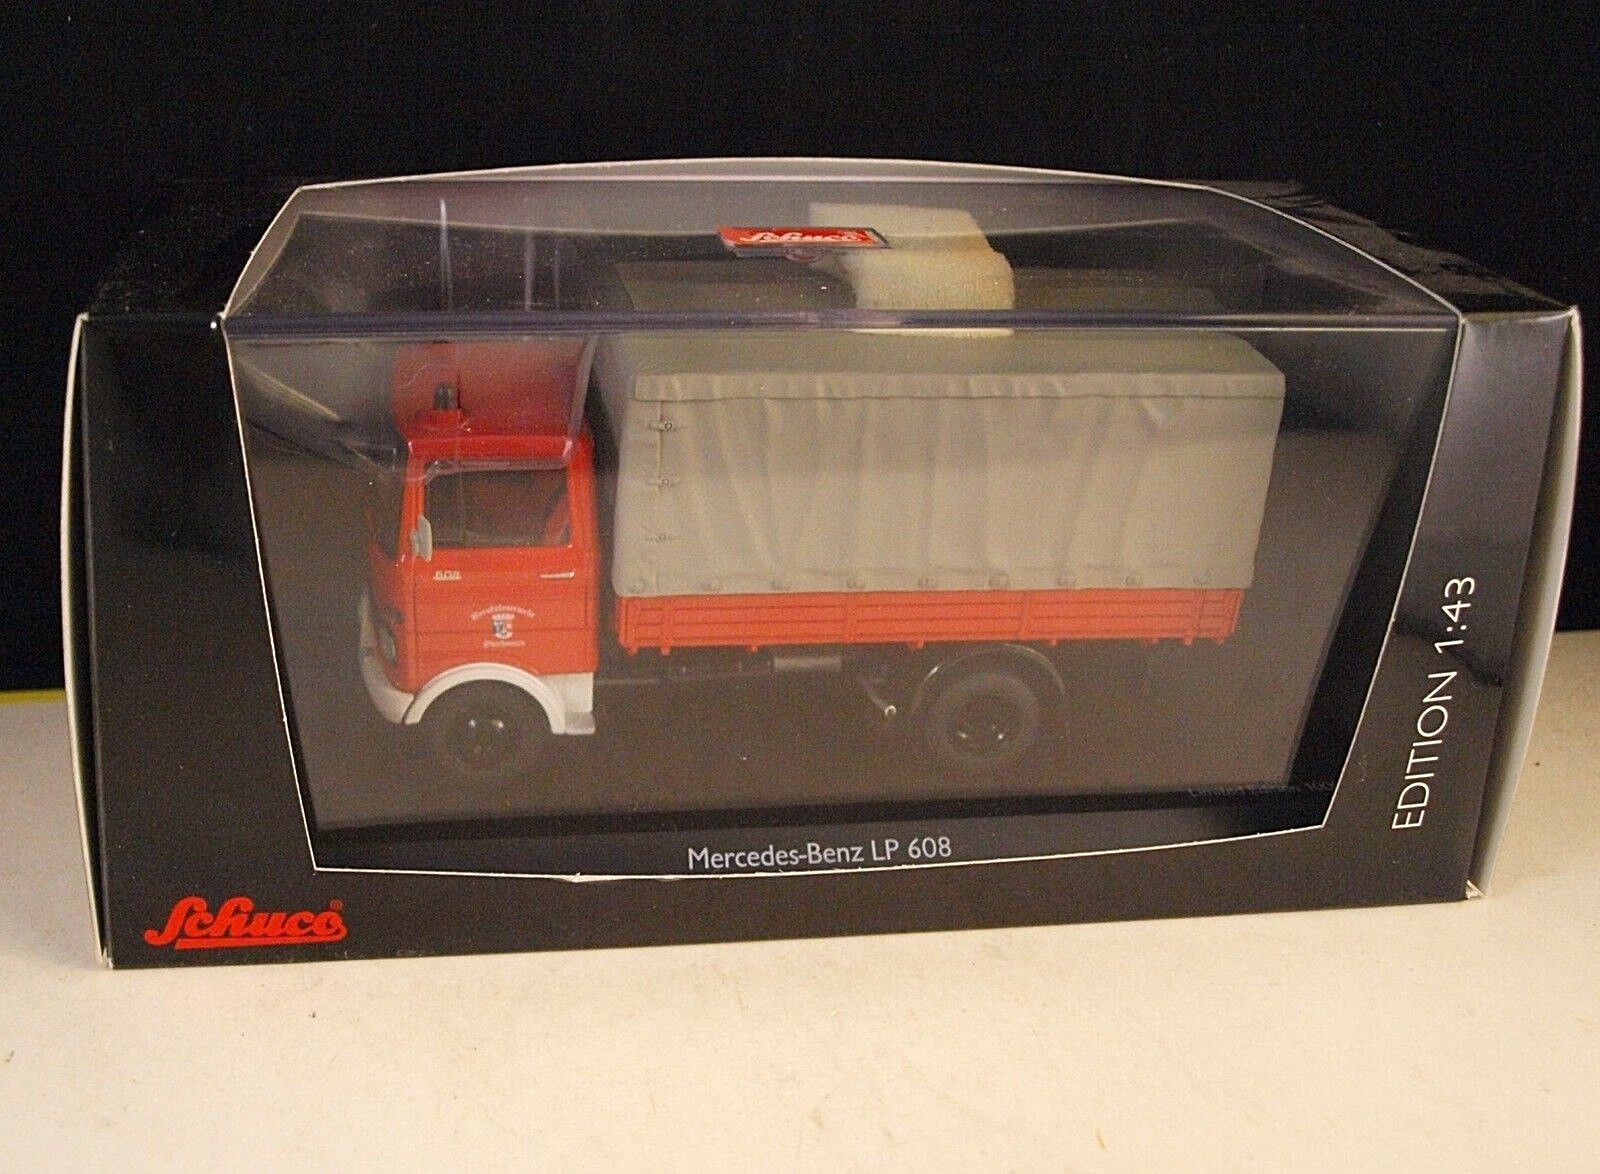 Schuco 03527 camion  Pompiers Mercedes Benz LP608 Oberhausen neuf 1 43 rare